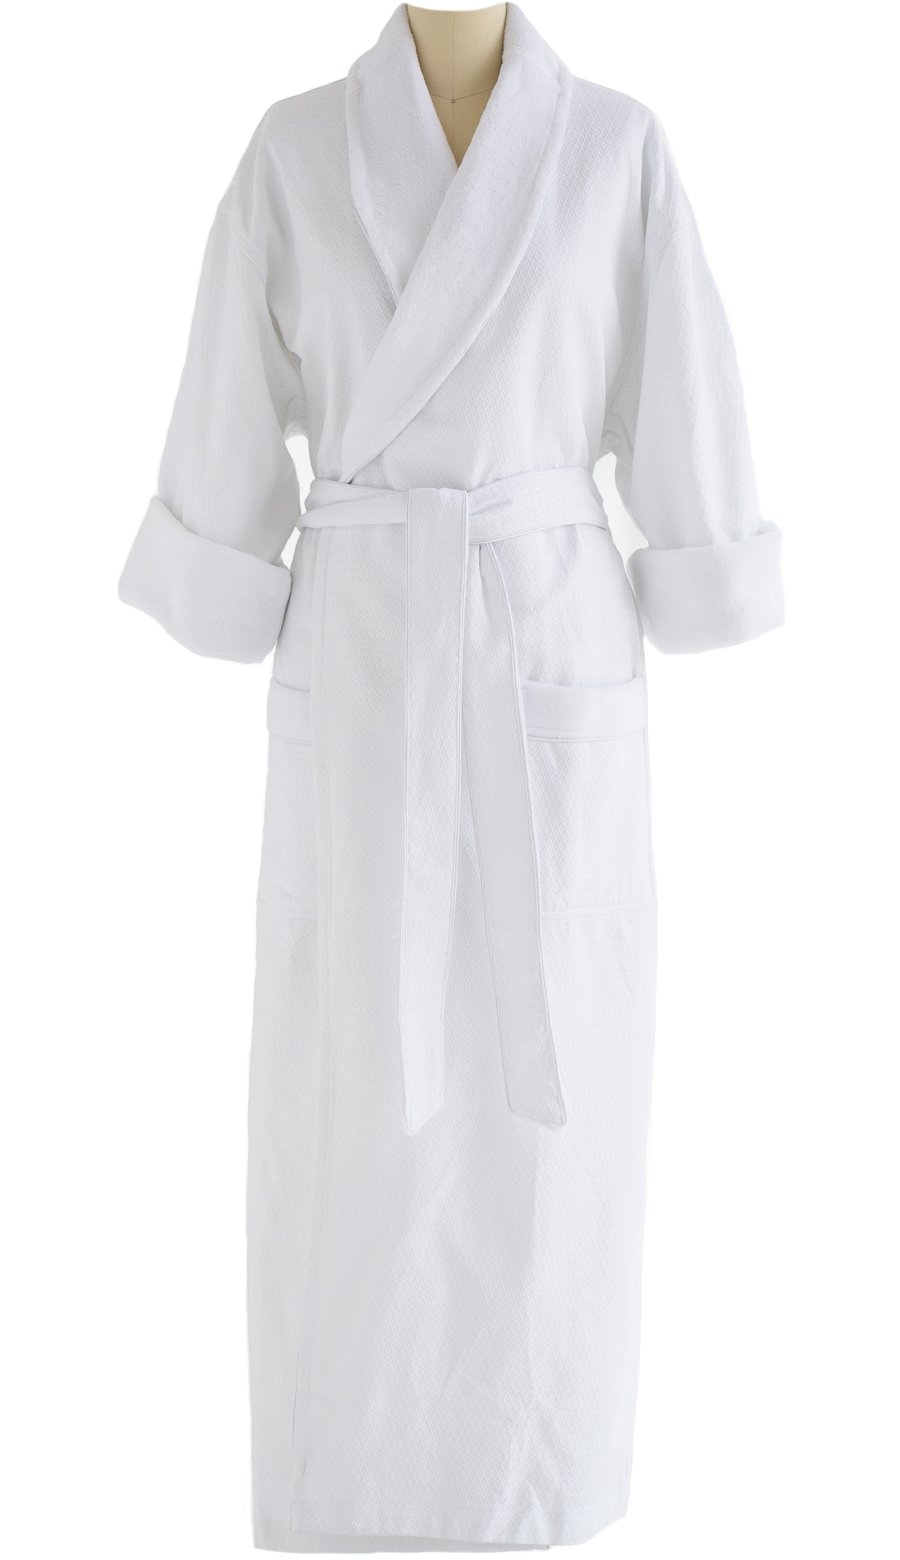 Full-Length Bathrobe - Diamond Jacquard Minx Lined Robe - 100% Cotton - Traditional Shawl Design - 4XL WHITE by Chadsworth & Haig (Image #4)